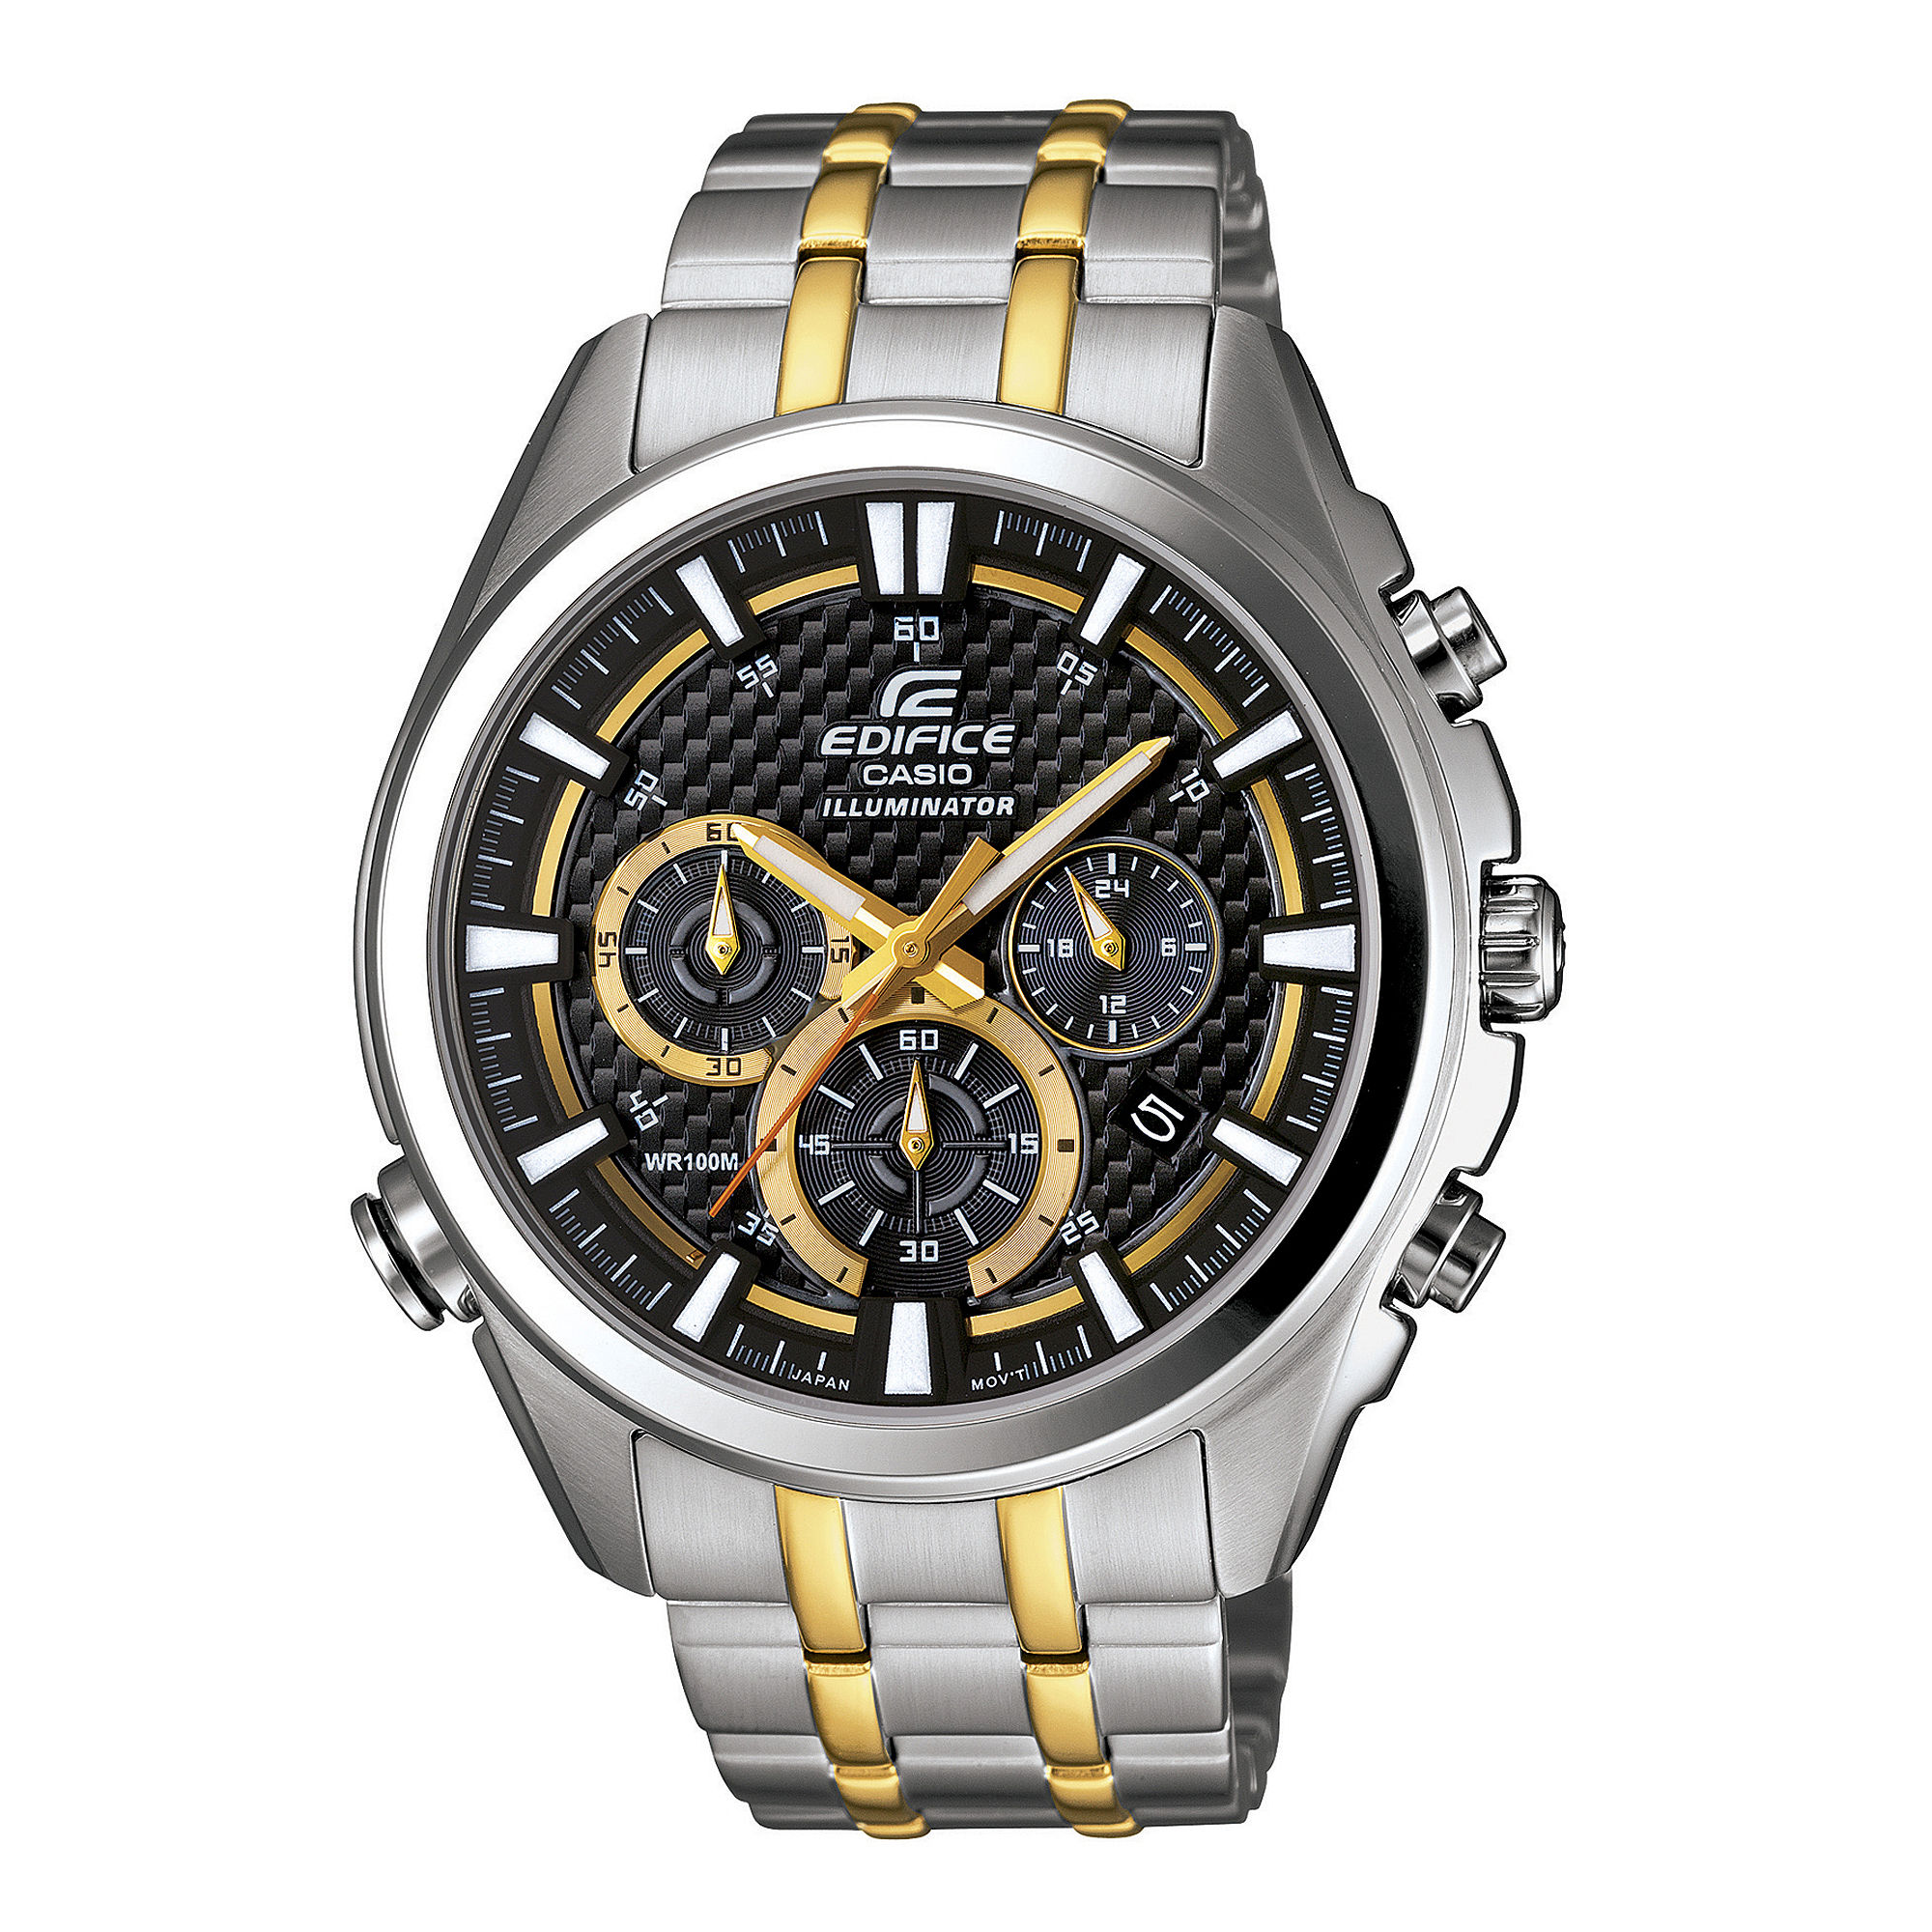 Casio Edifice Illuminator Mens Chronograph Sport Watch EFR537SG-1AV